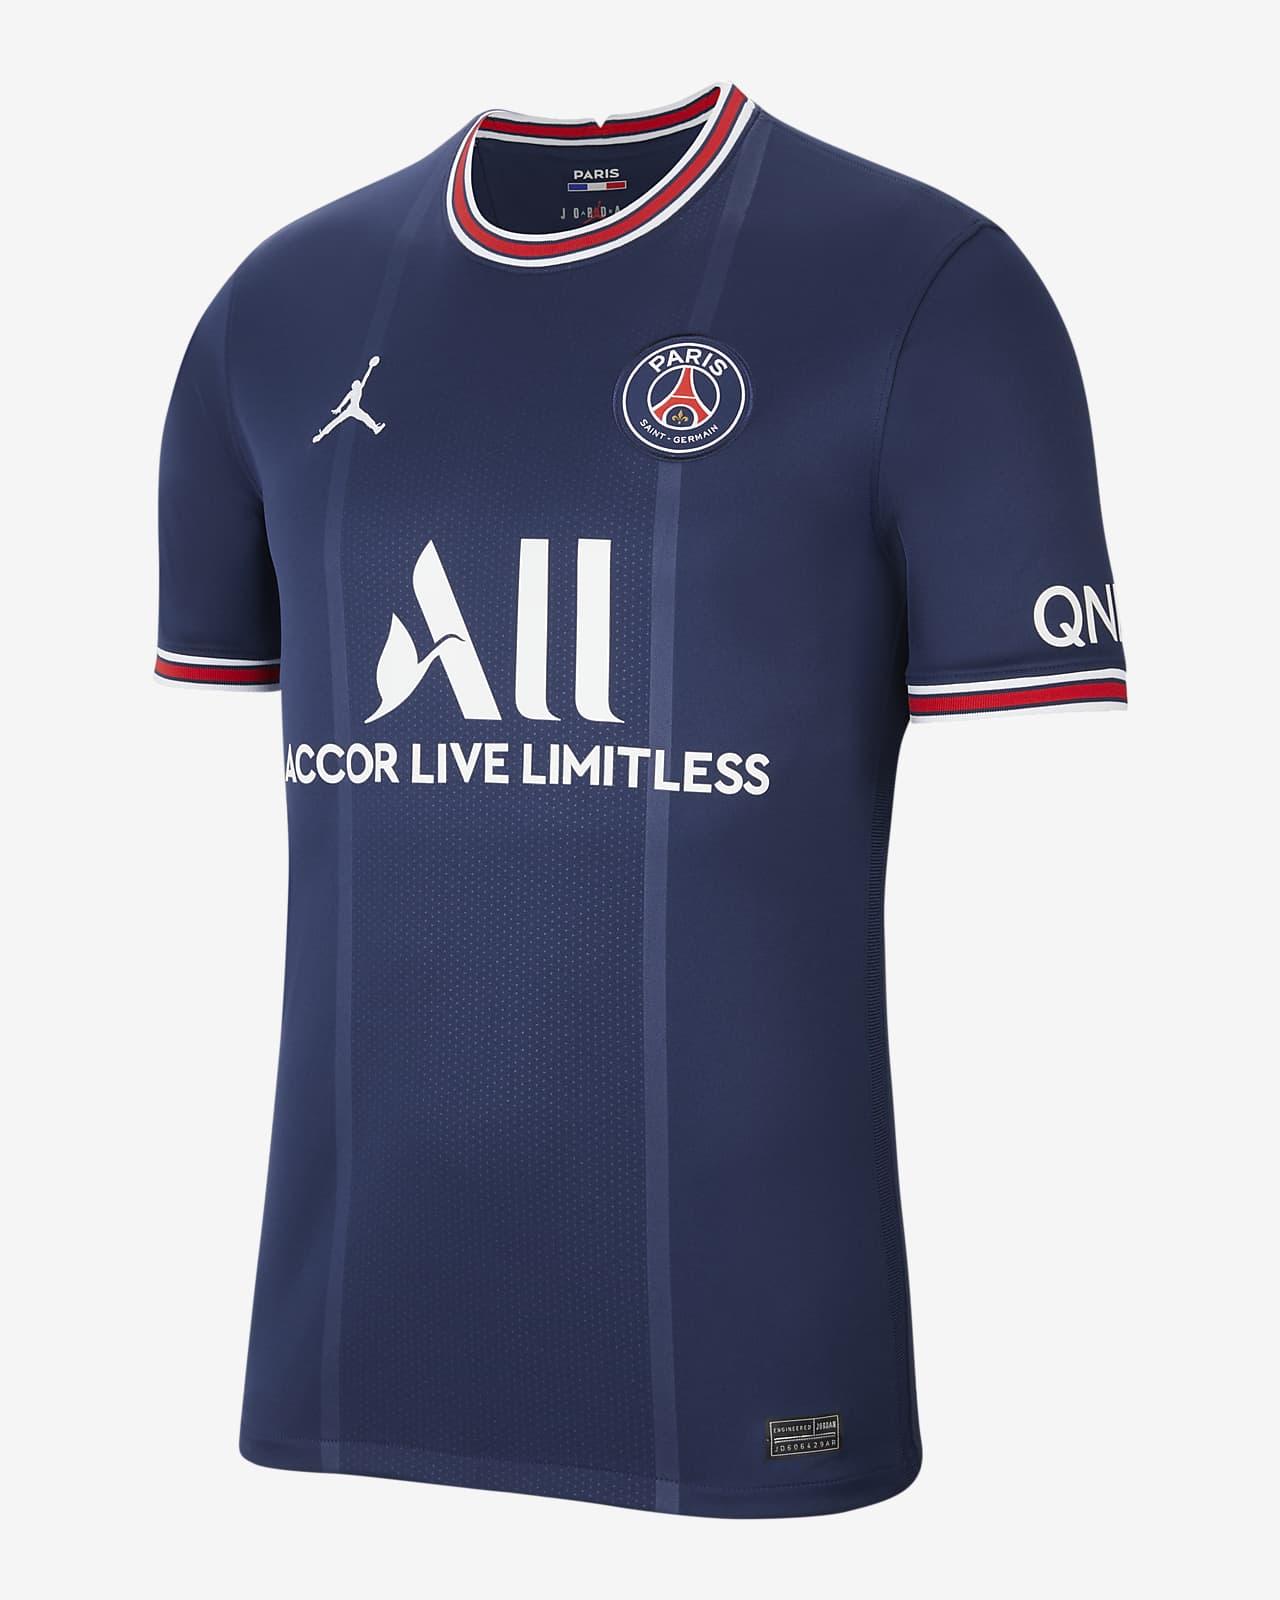 Buy paris saint germain maglia 2021 cheap online